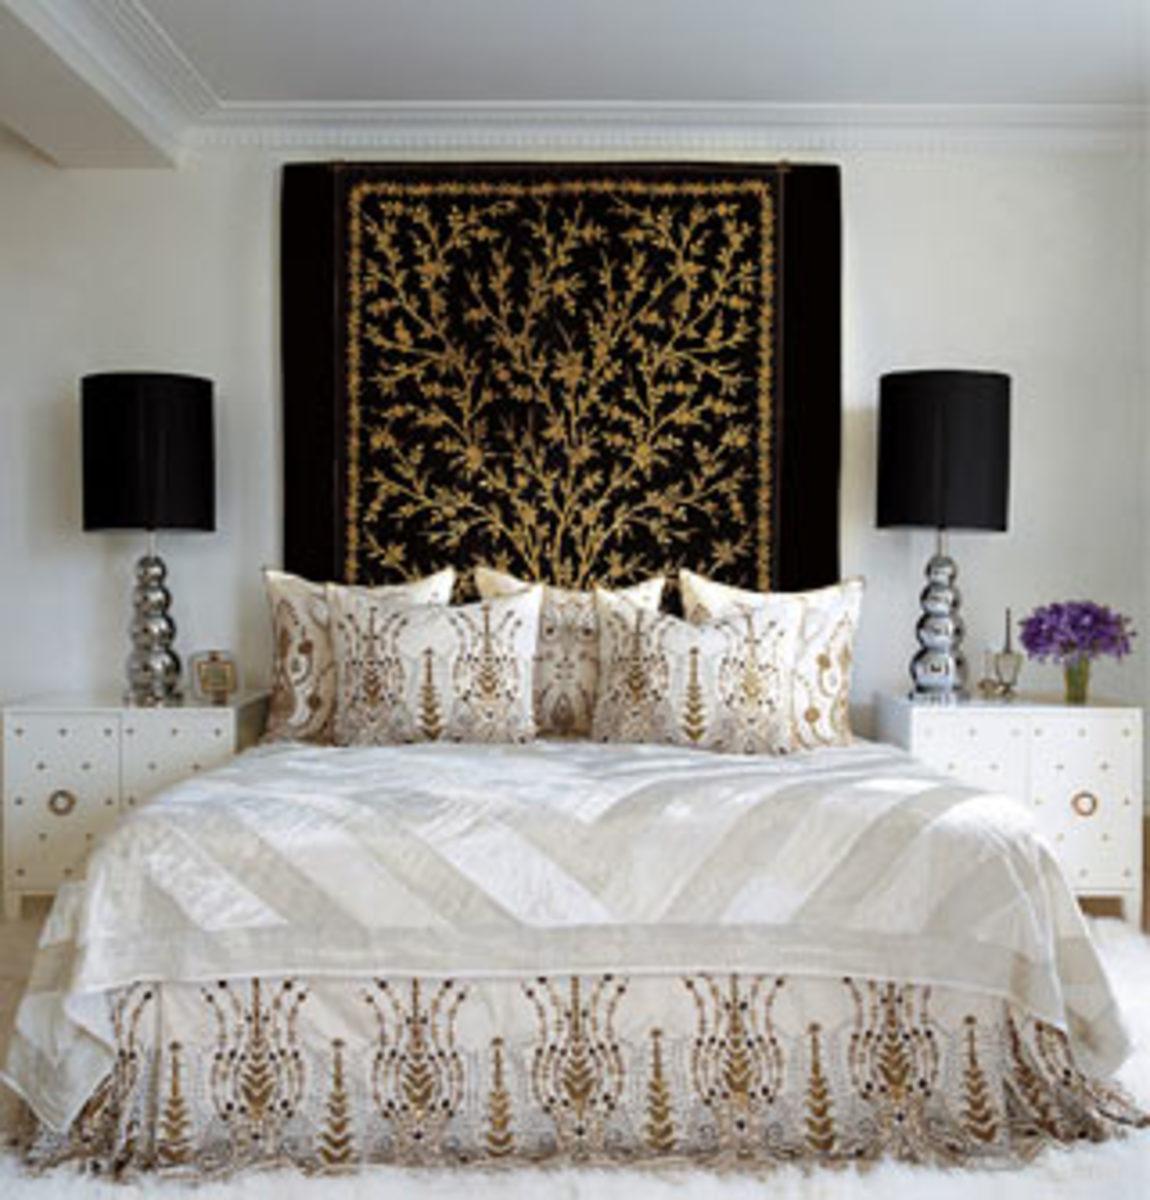 """White bedroom"" of Tamara Mellon."